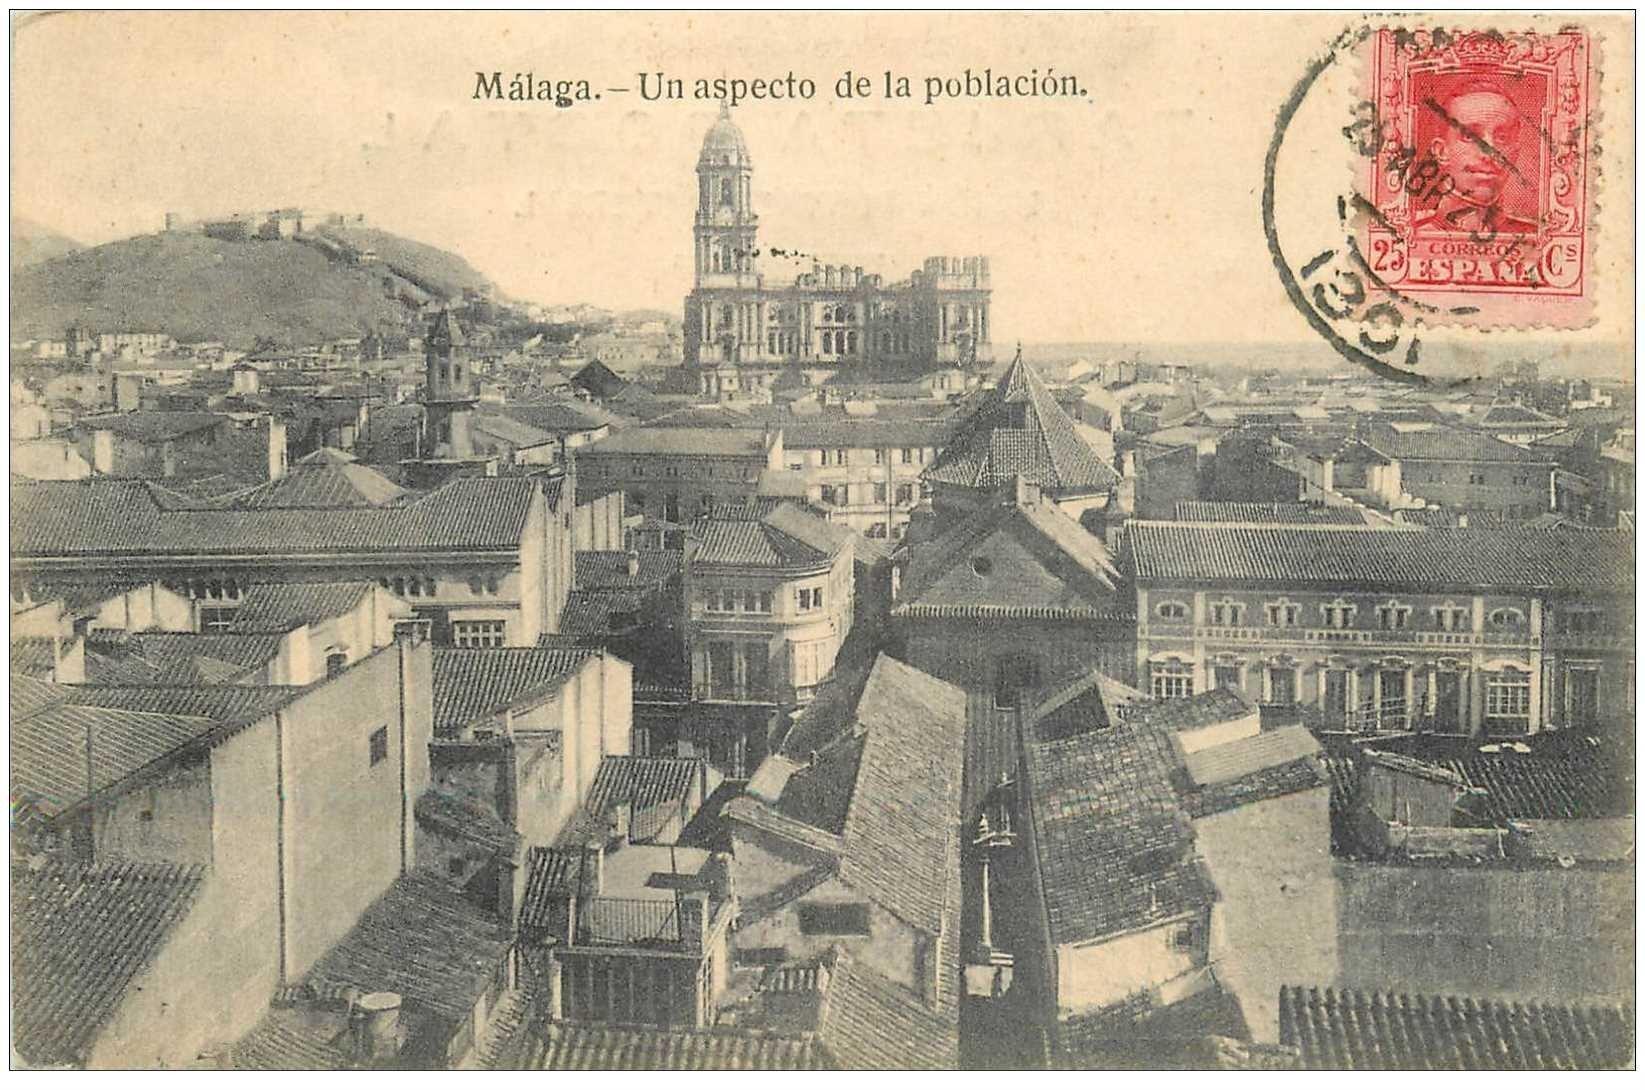 carte postale ancienne Espagne. MALAGA. Aspecto de la ploblacion 1925